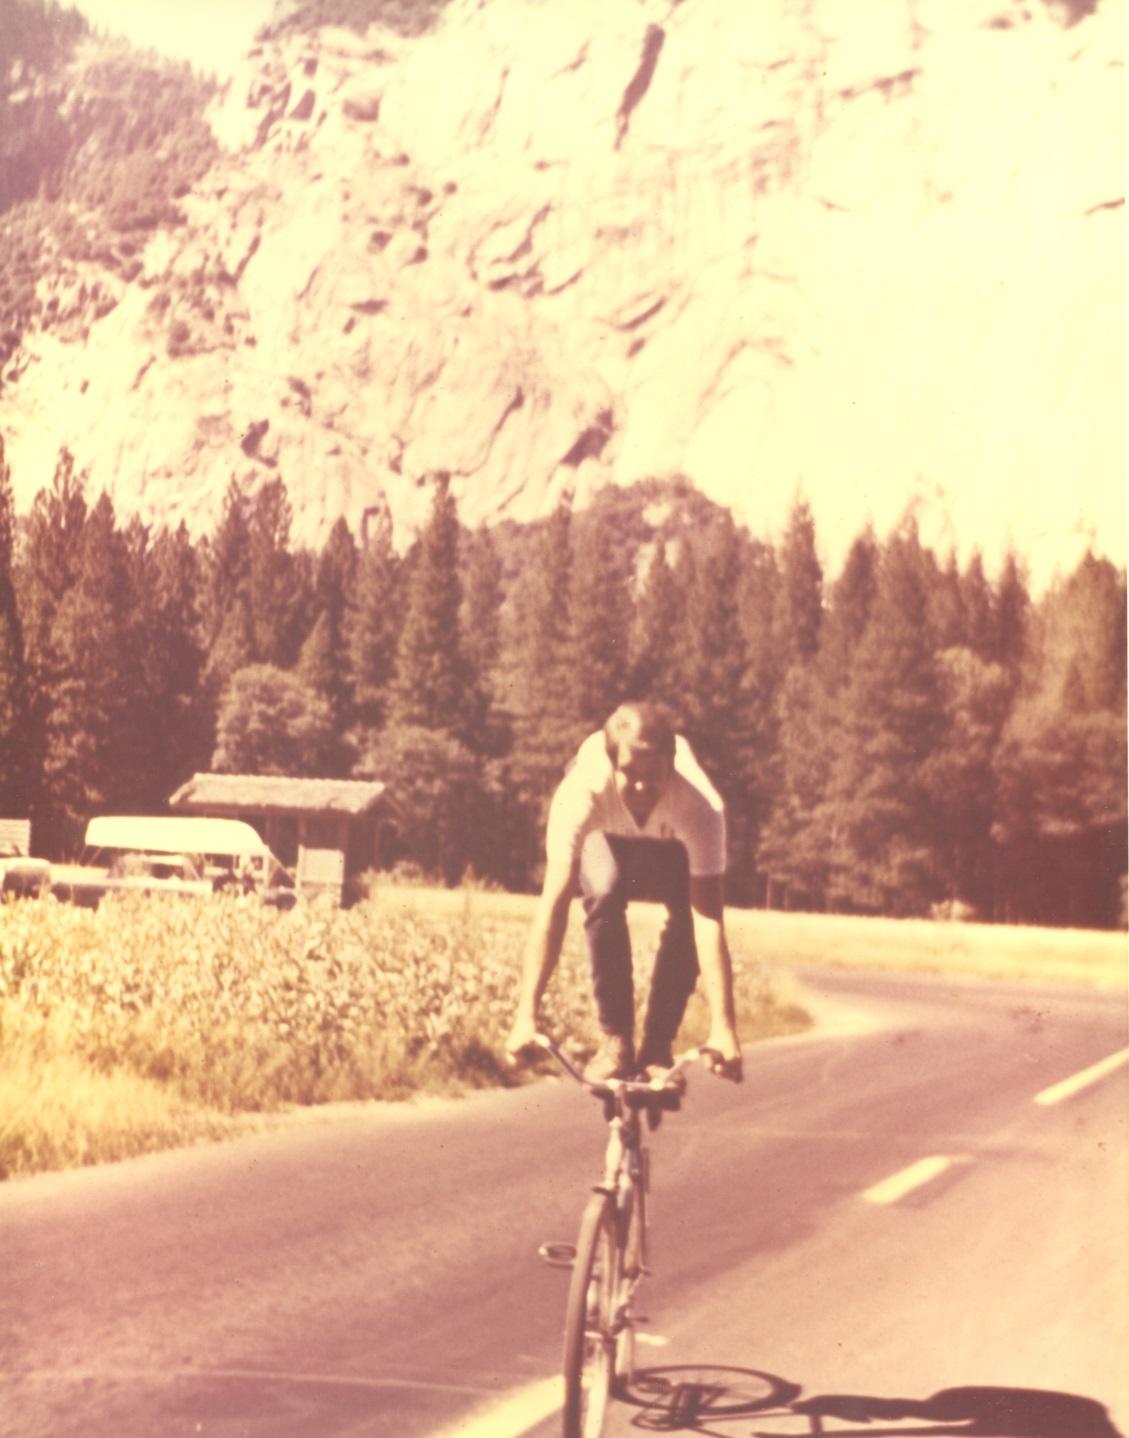 Jim Riordan Standing on bicycle seat in Yosemite